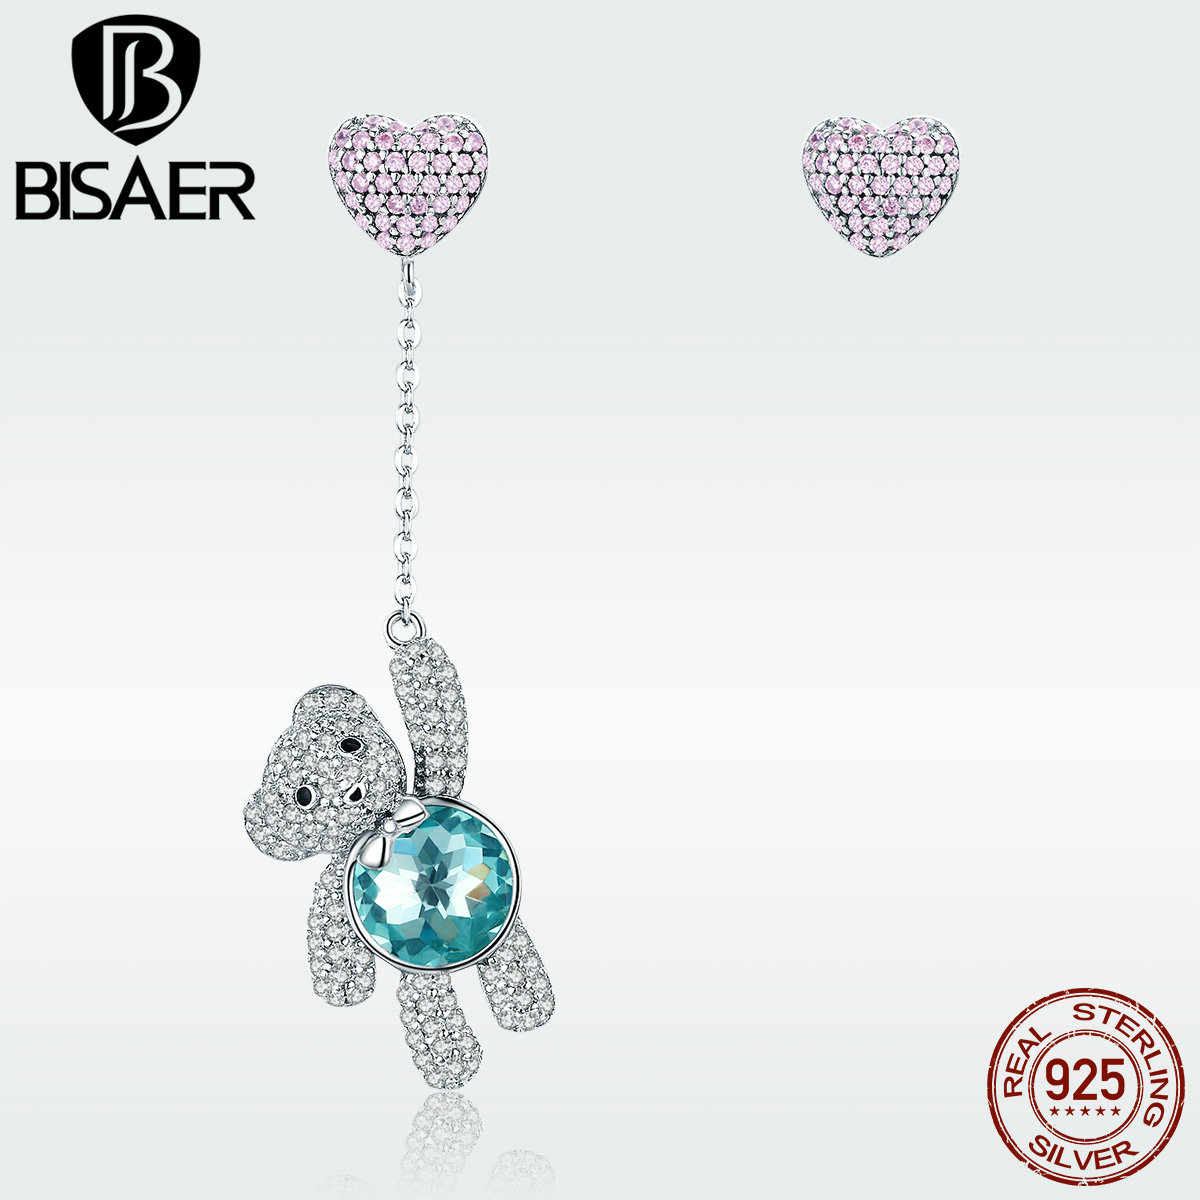 Love Teddy Bear Earrings 925 Sterling Silver Pink CZ Heart Balloon Blue Crystal Bear Drop Earrings For Girl Birthday Gift GXE388 pair of delicate heart faux pink crystal earrings for women